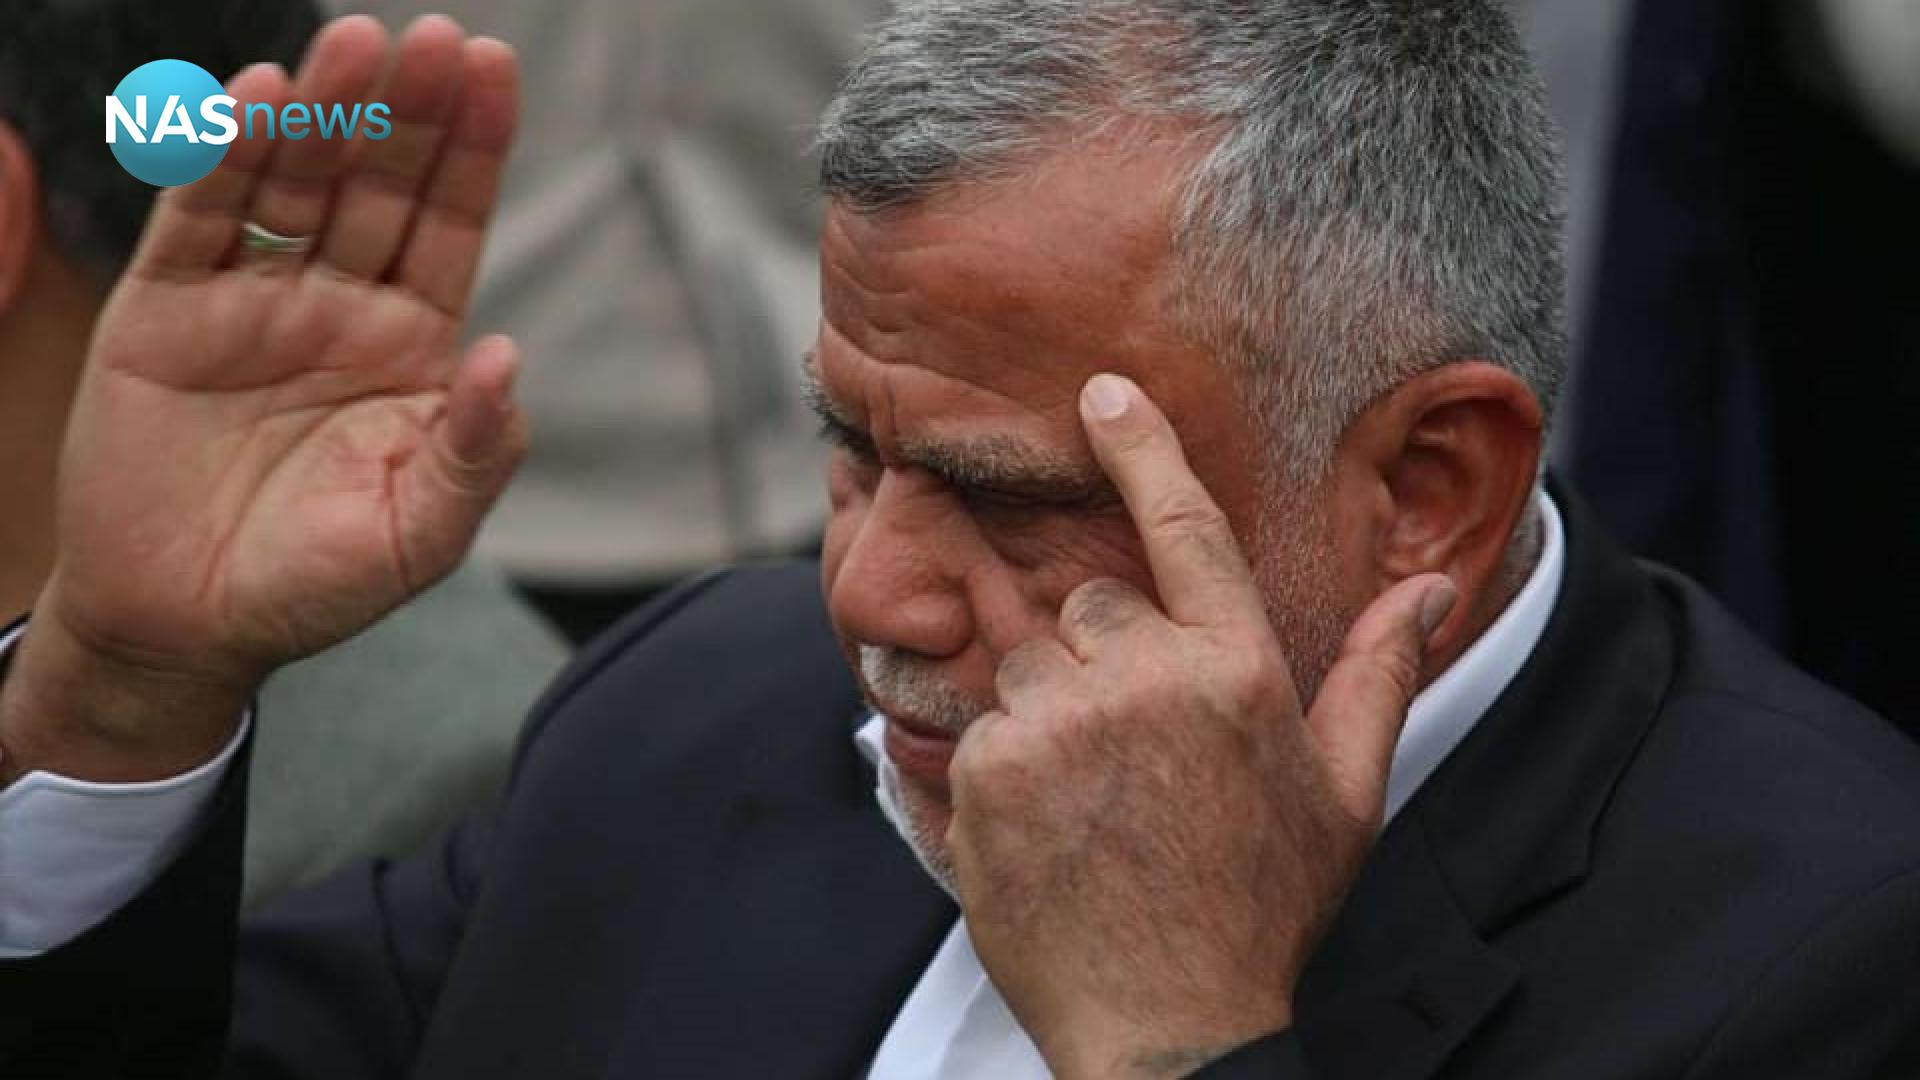 Hadi Al-Amiri - Al-Fateh bloc will achieve a overwhelming victory in the October elections